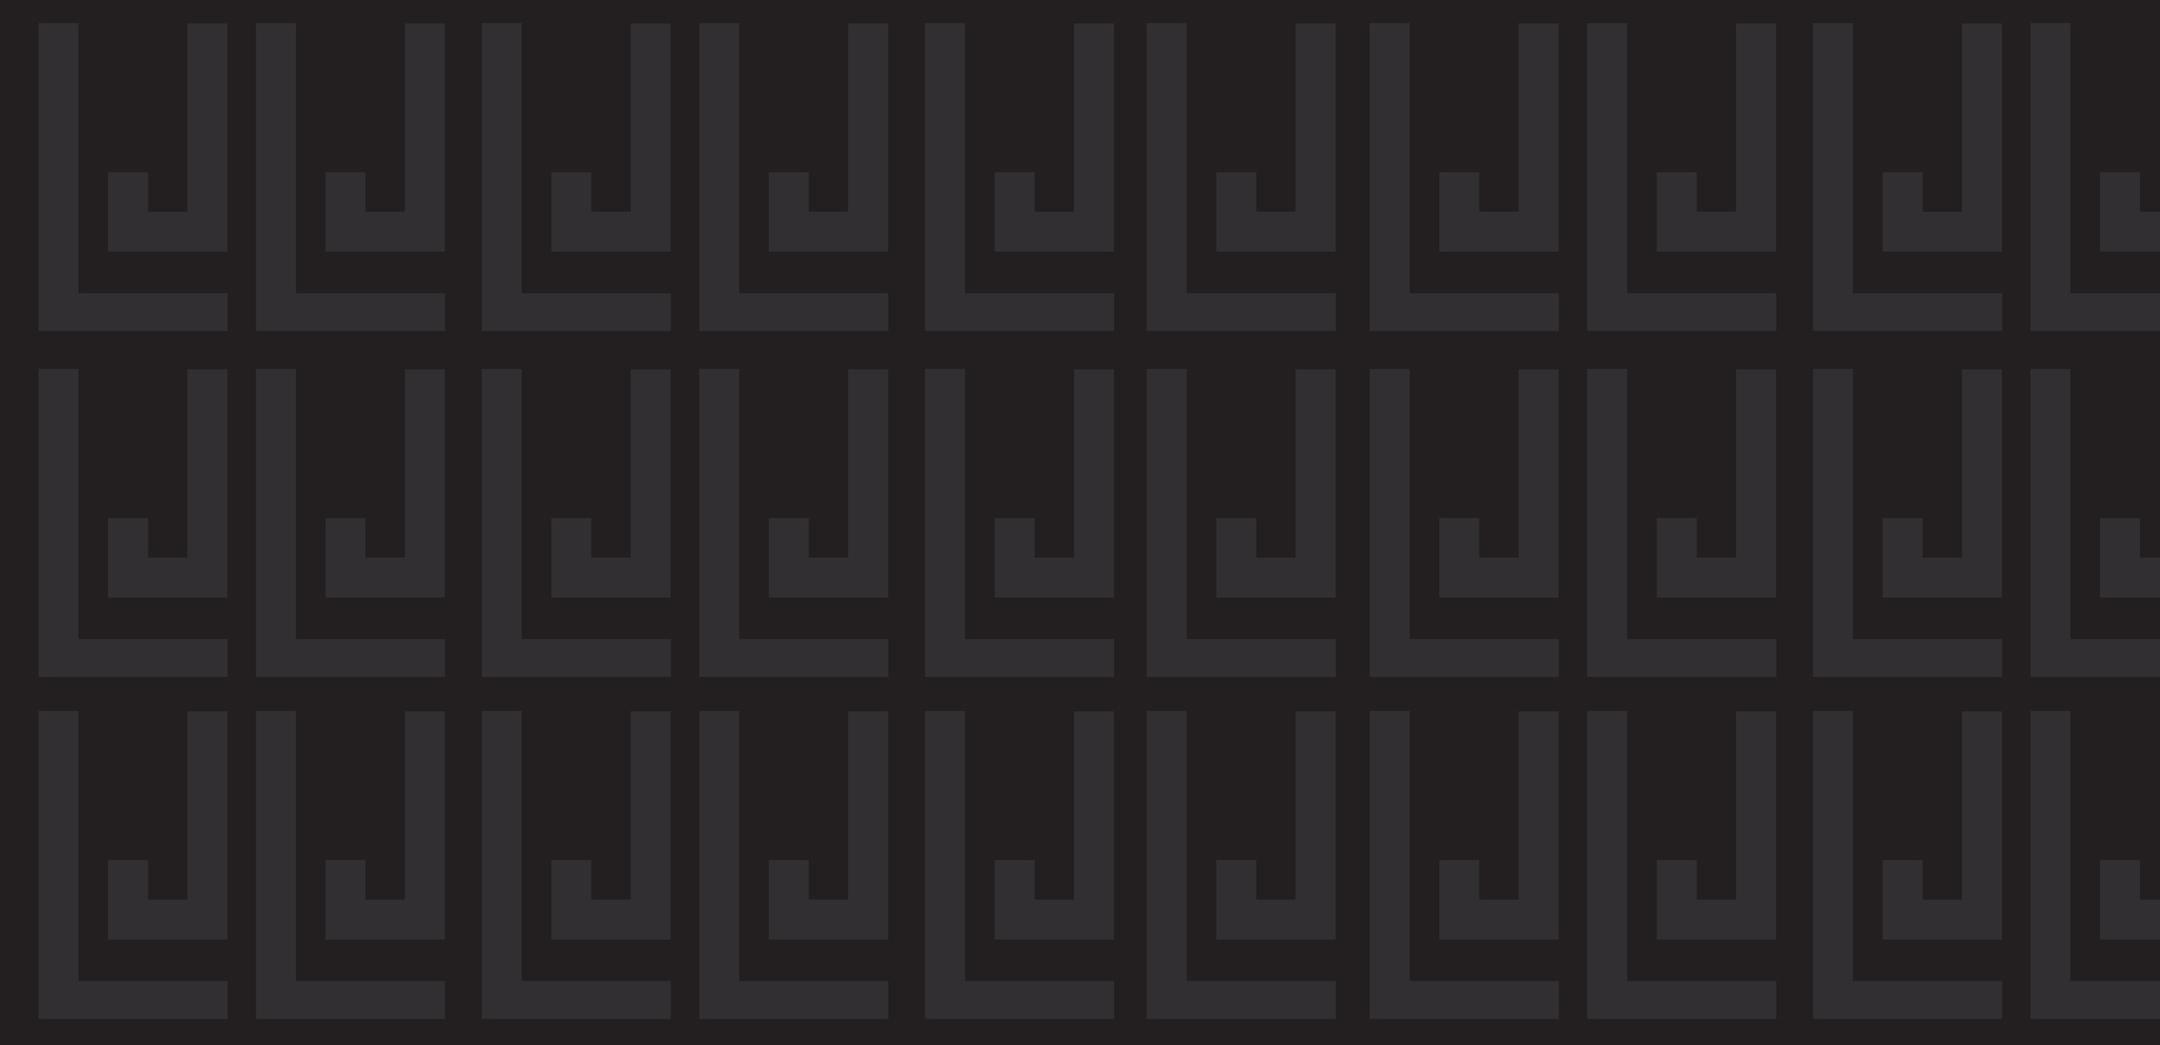 LJ-Web-Background